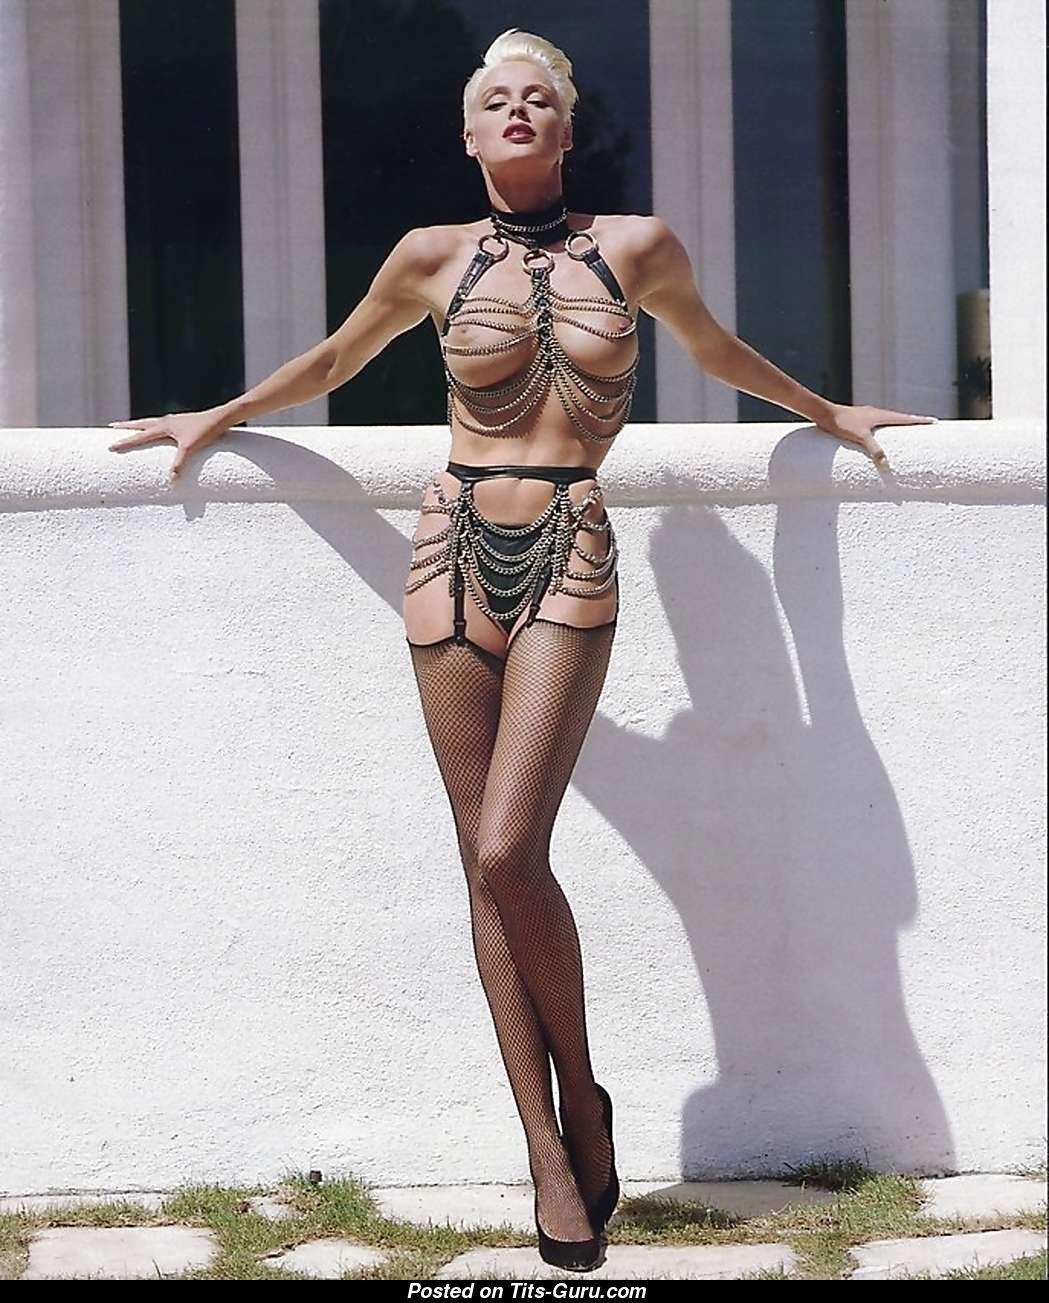 Sex Brigitte Nielsen nude photos 2019